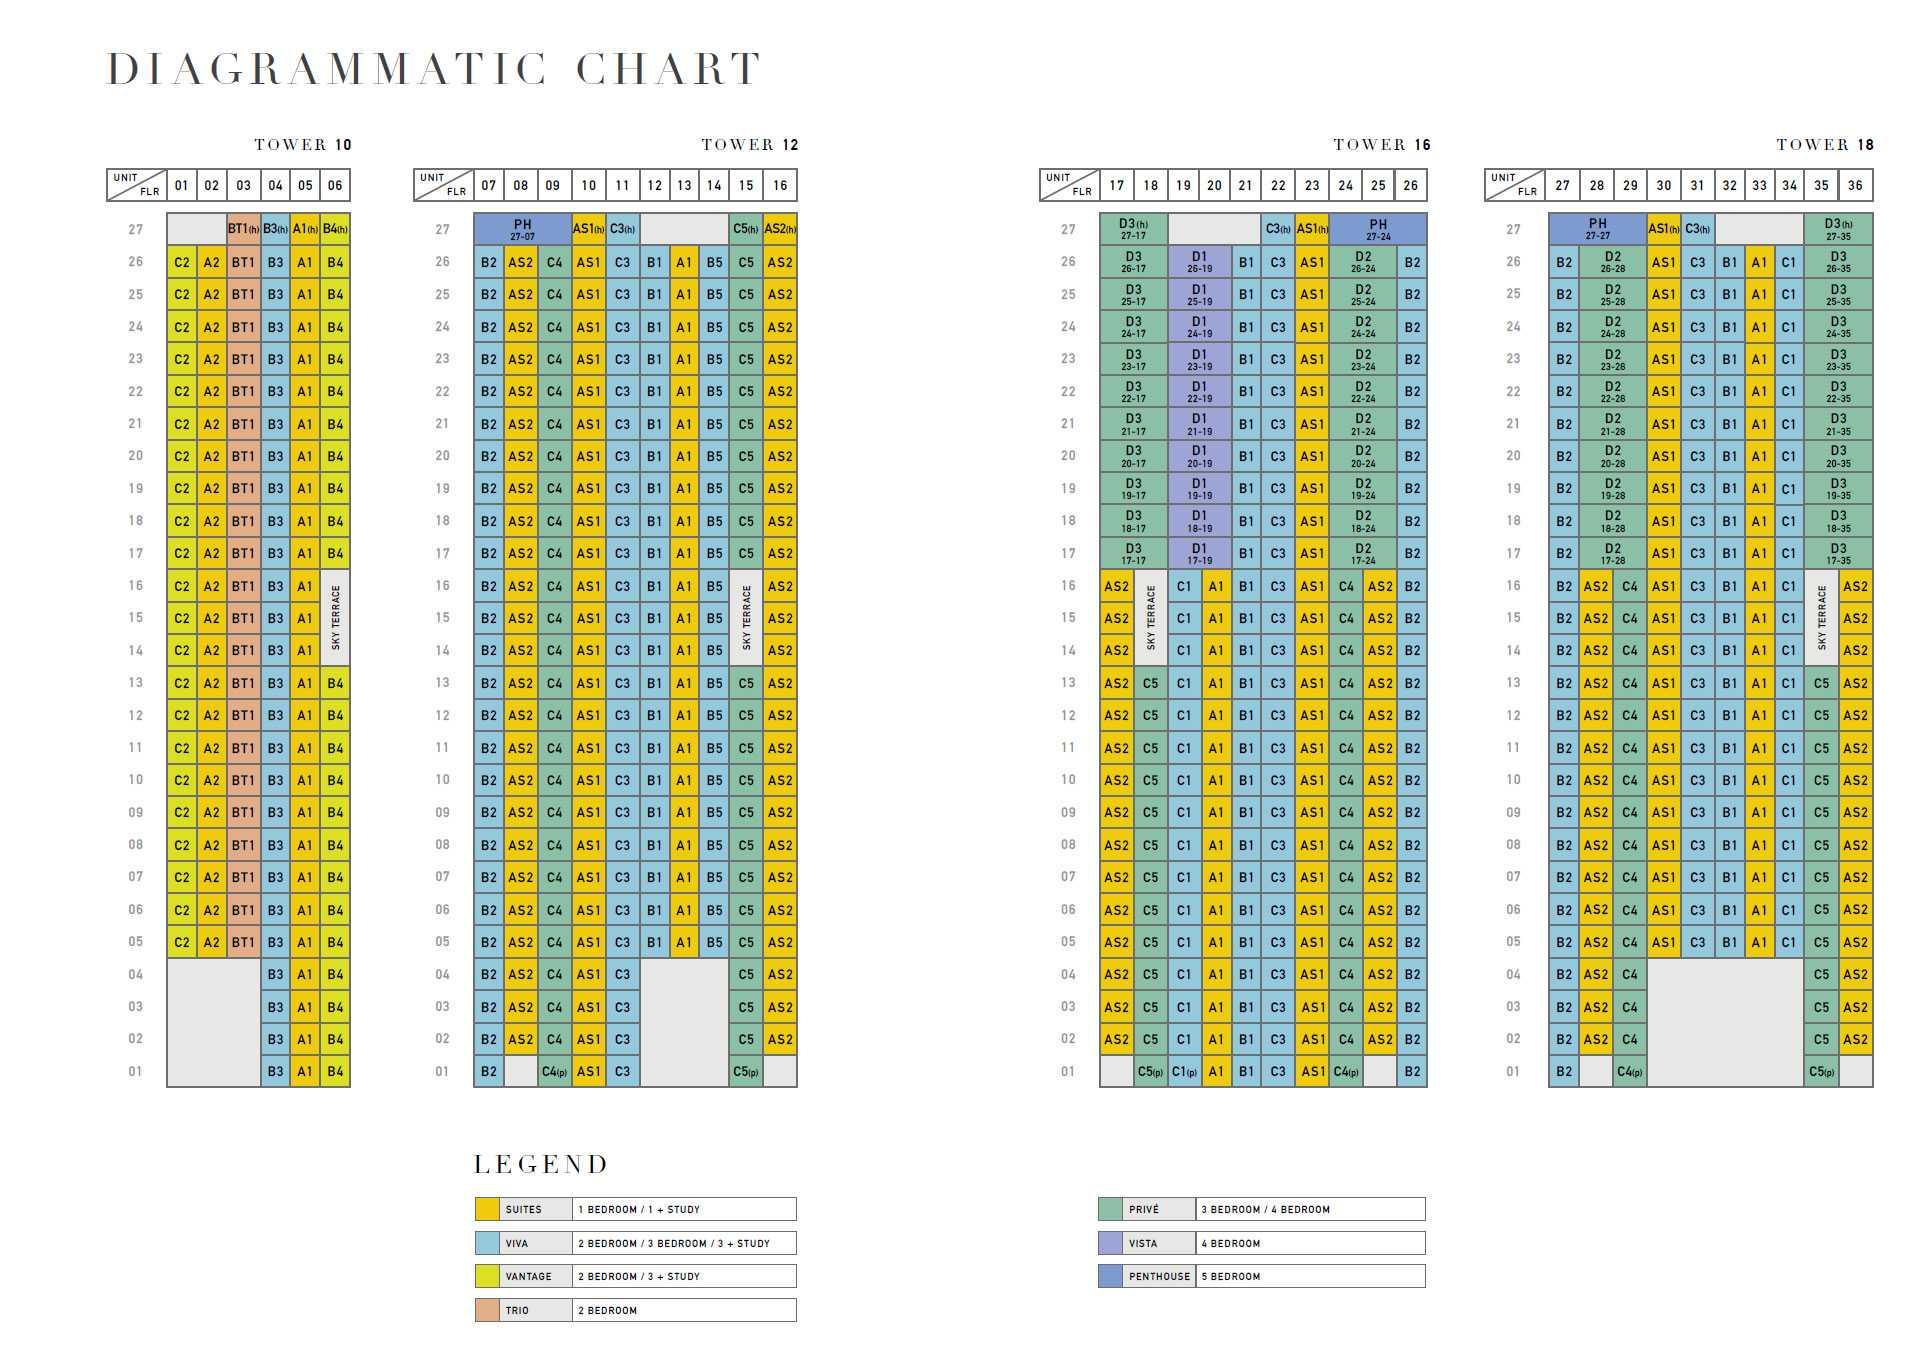 seaside-residences-diagrammatic-chart